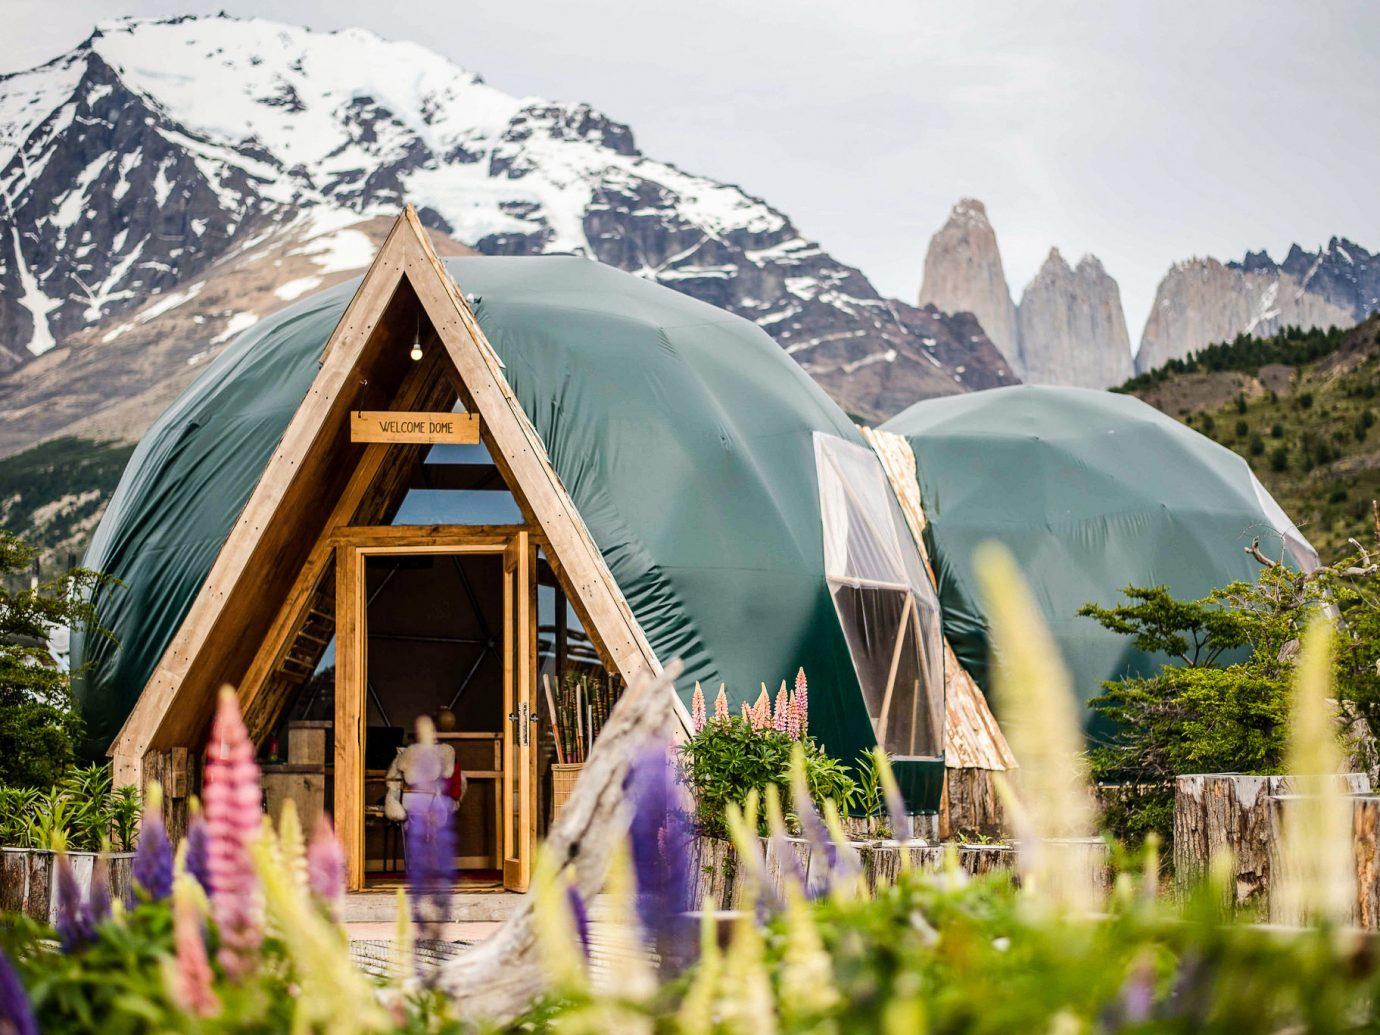 home hut dome tent plant cottage tree house mountain leisure tourism landscape elevation